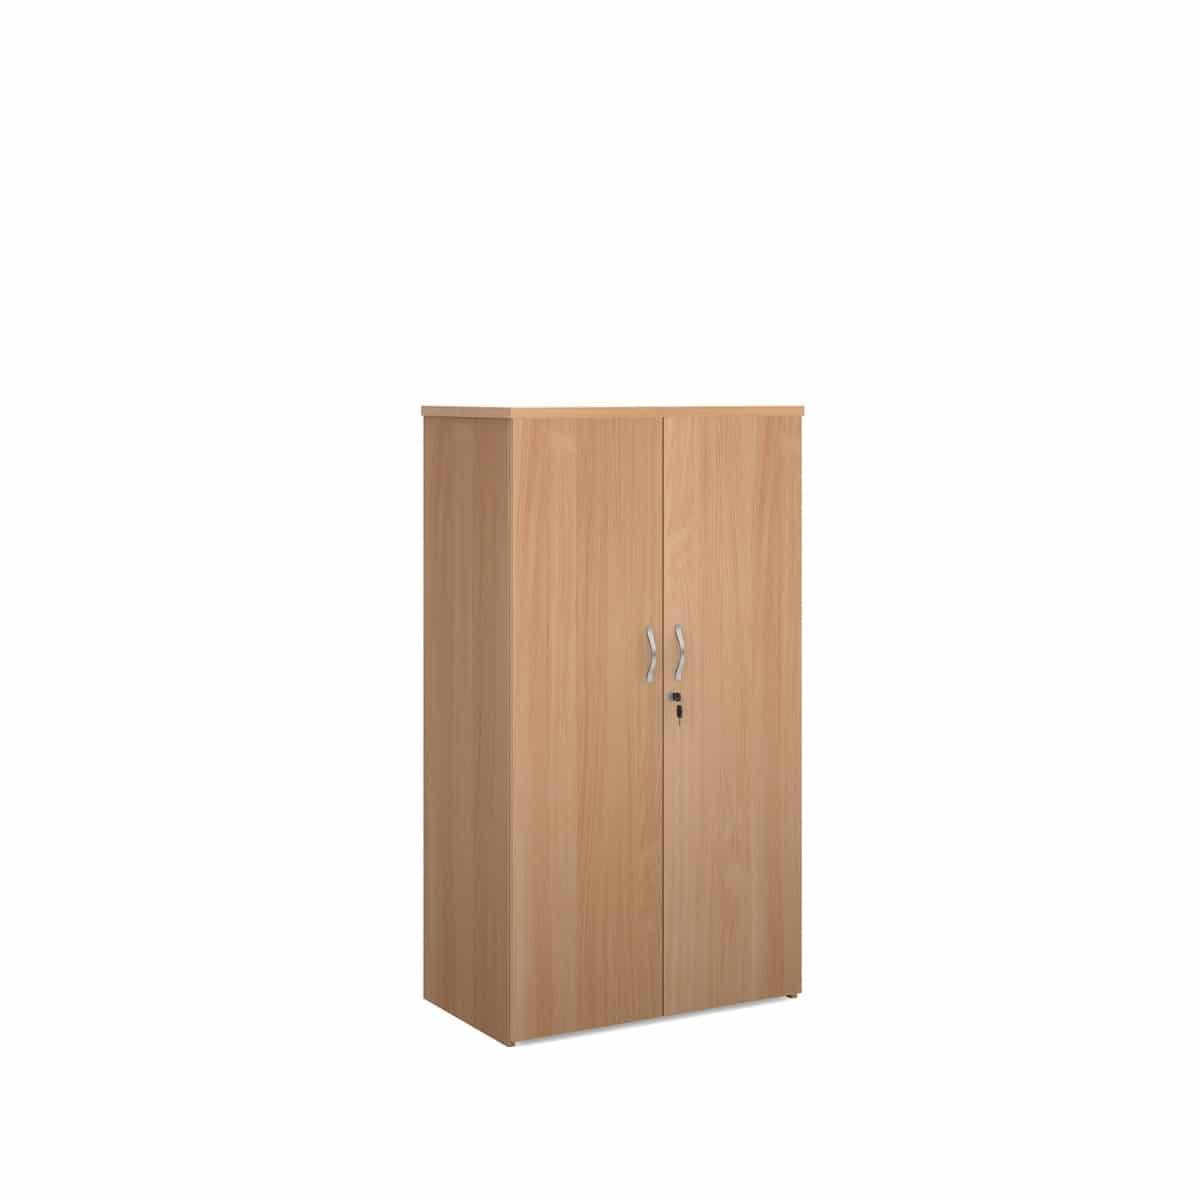 Beech wood office tall storage cupboard 1440mm 3 shelf bimi for Ready built cupboards